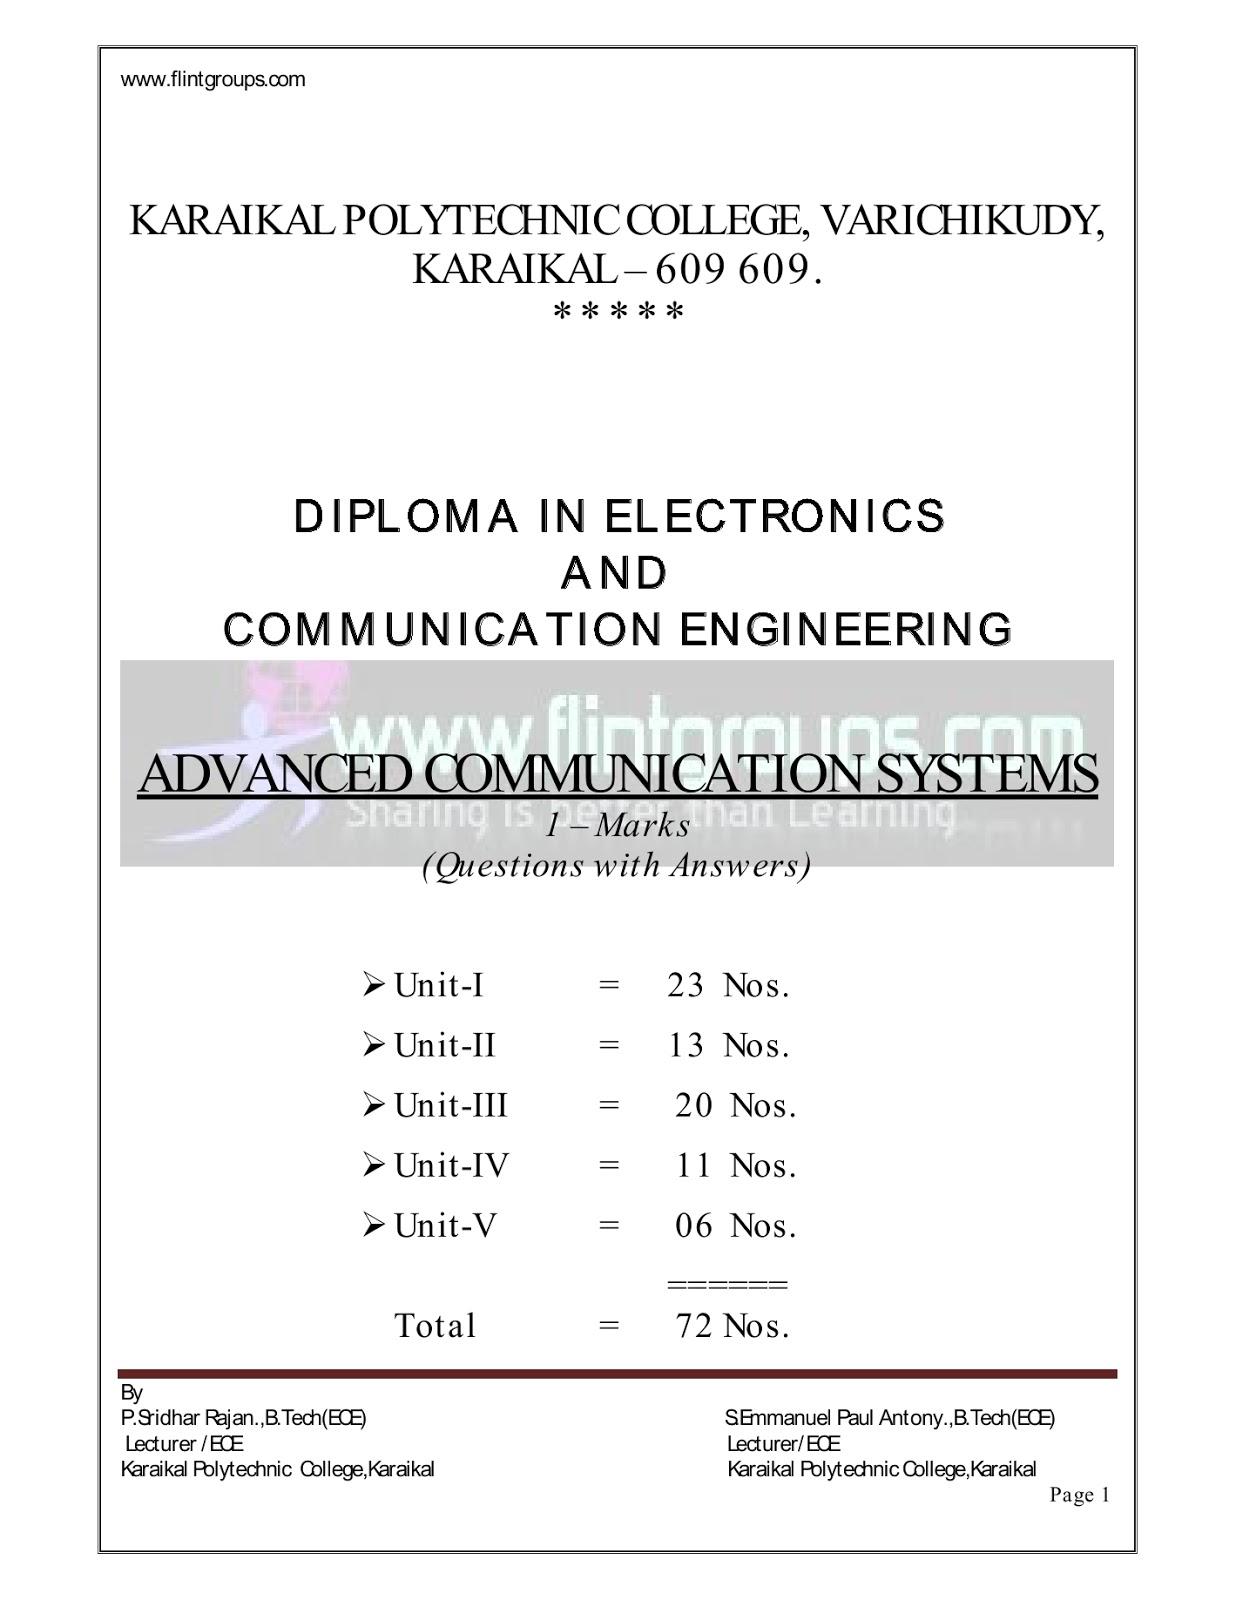 Advanced Communication System : Tamil Nadu Polytechnic One